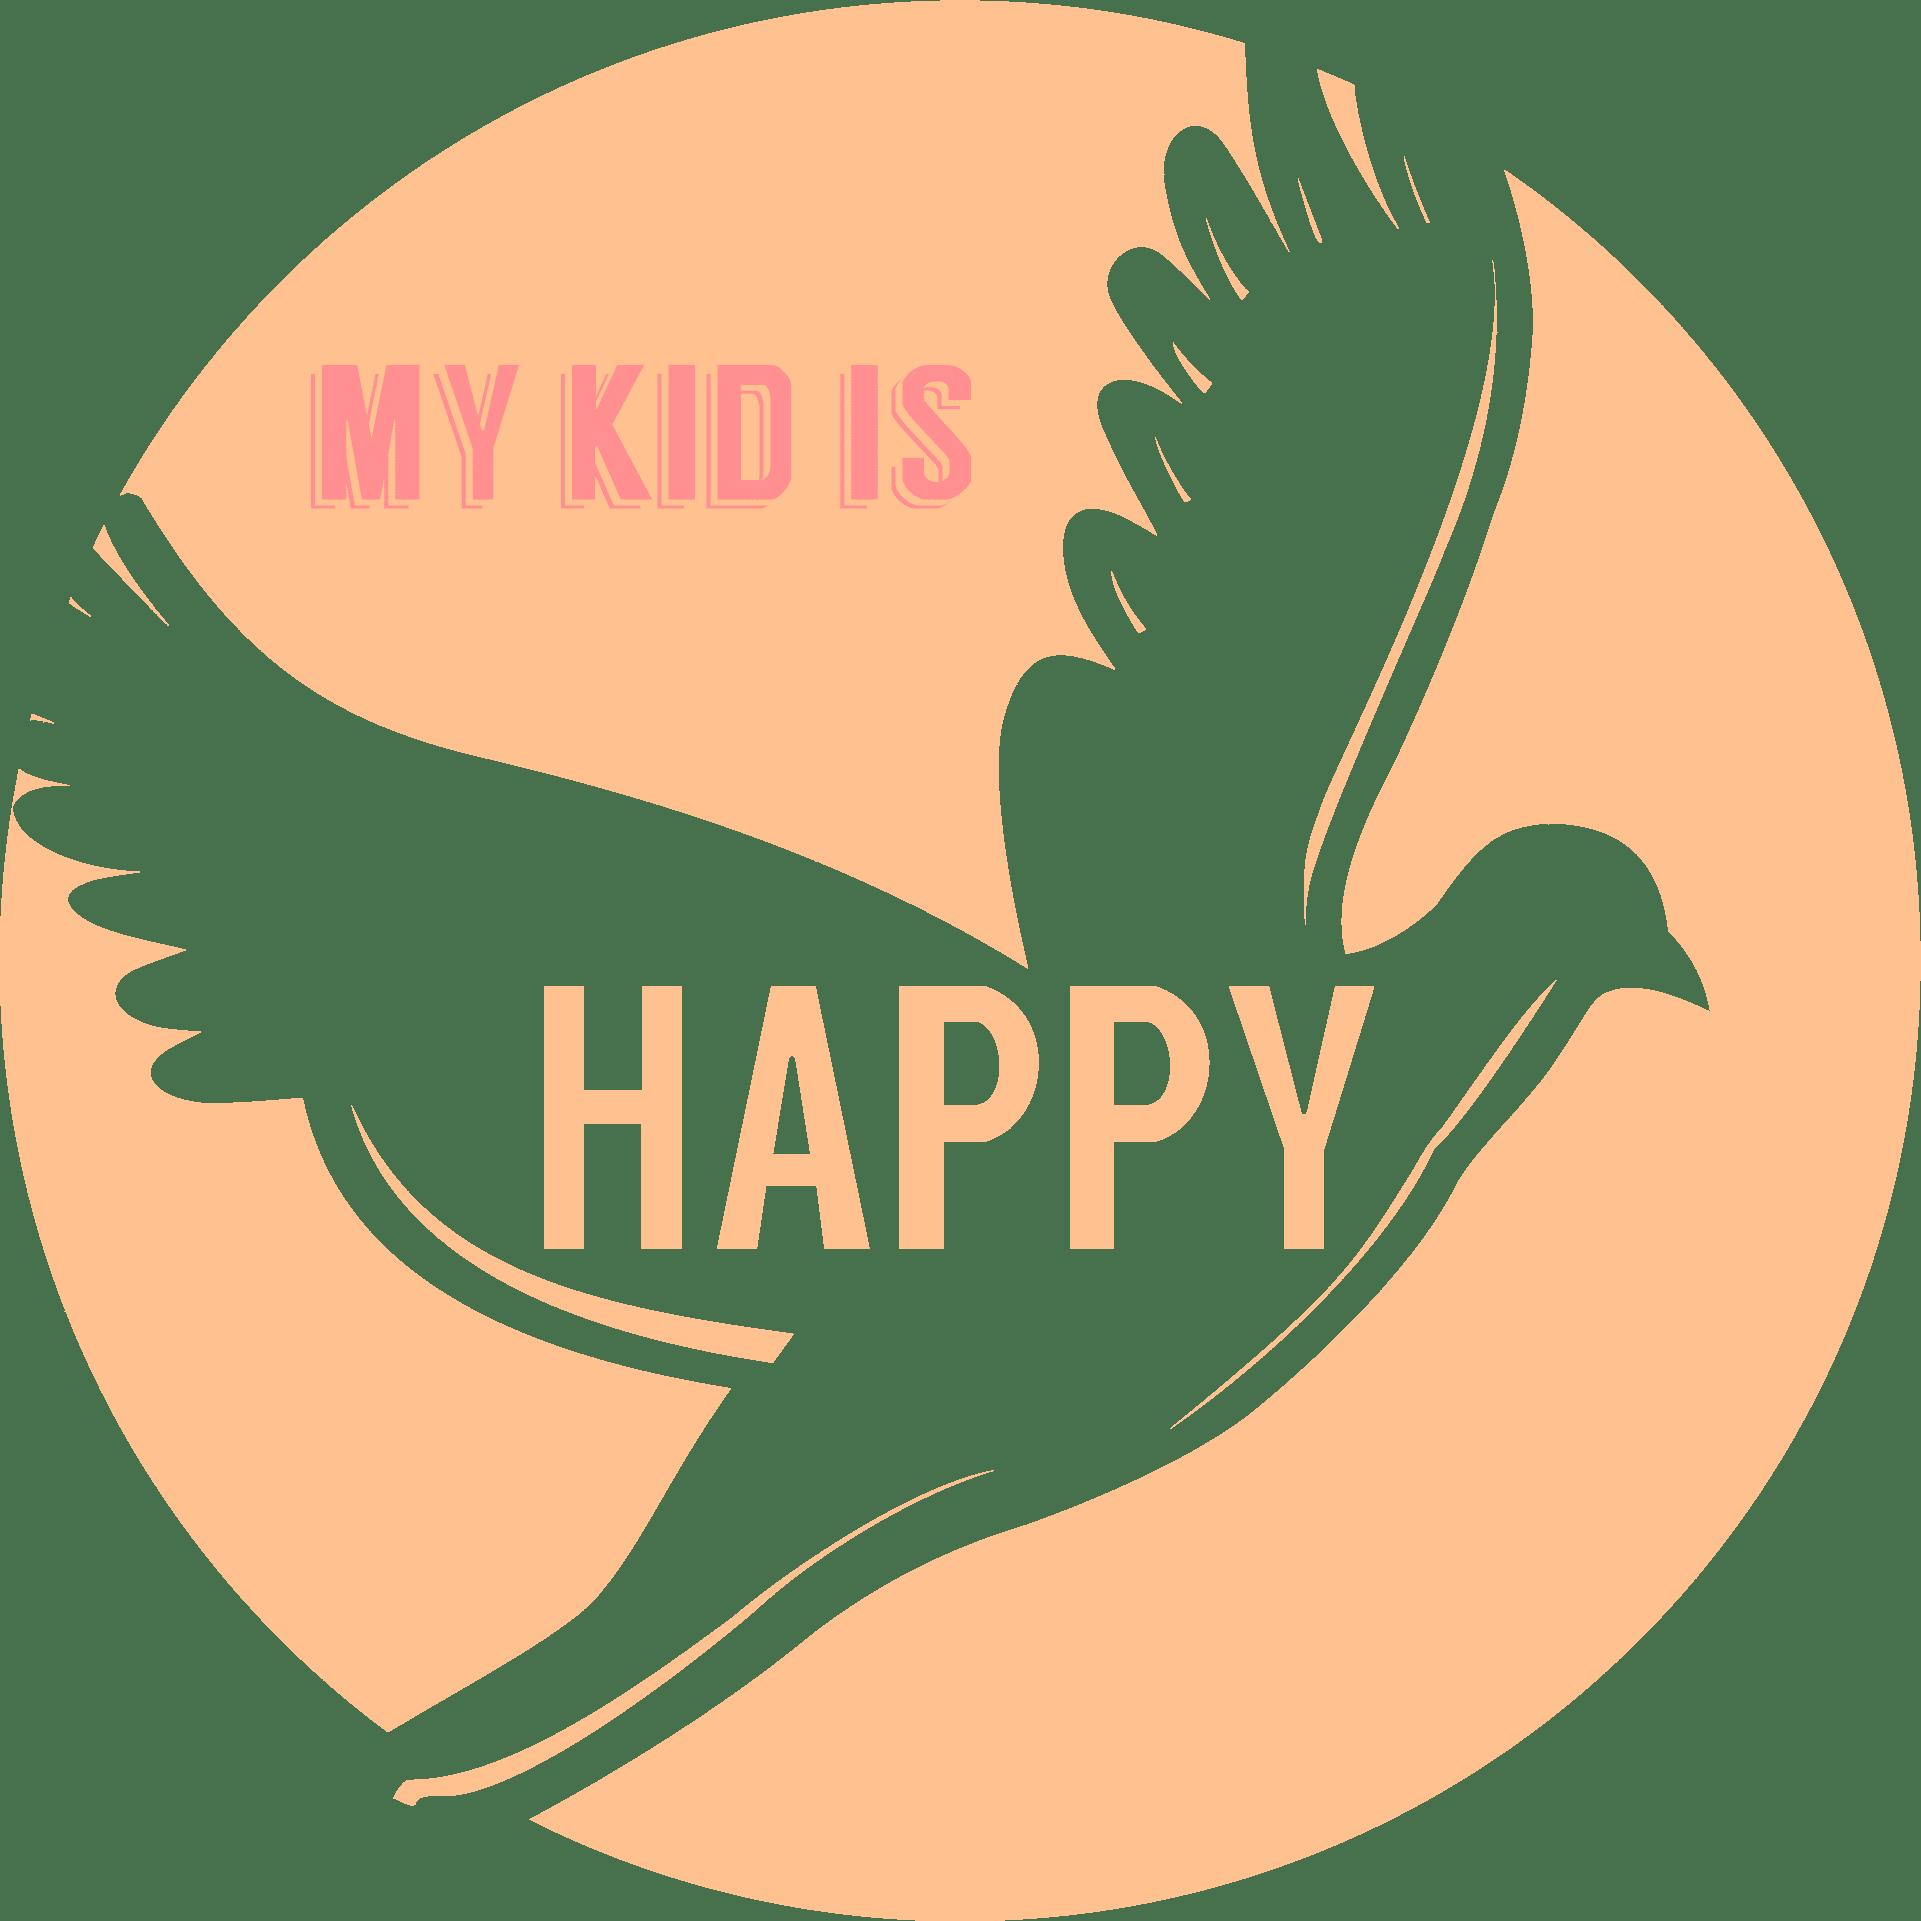 My kid is happy